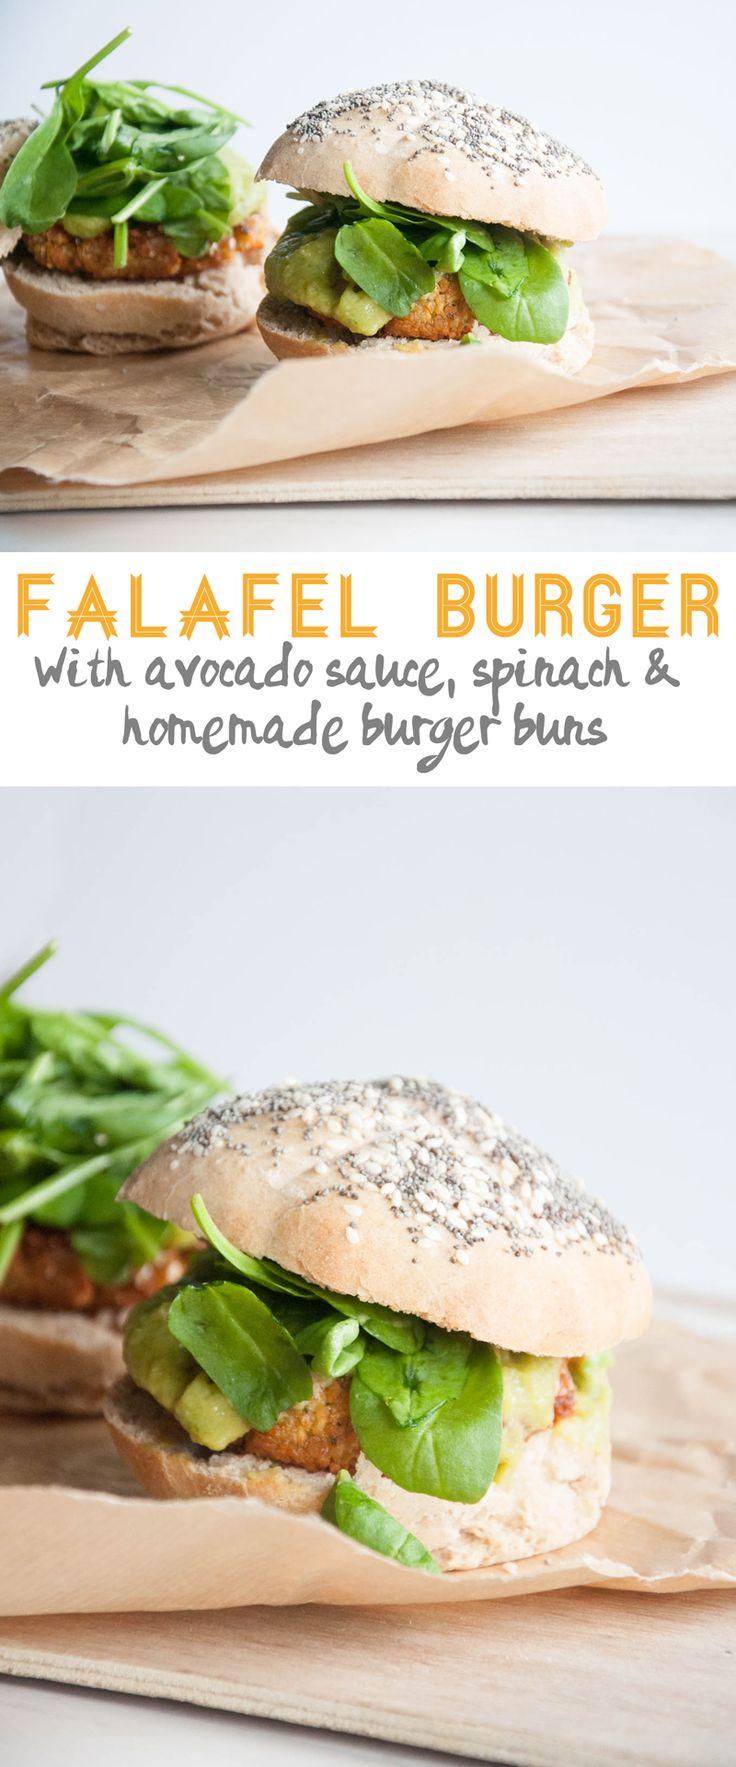 Vegan Falafel Burger with spinach & homemade burger buns | ElephantasticVegan.com